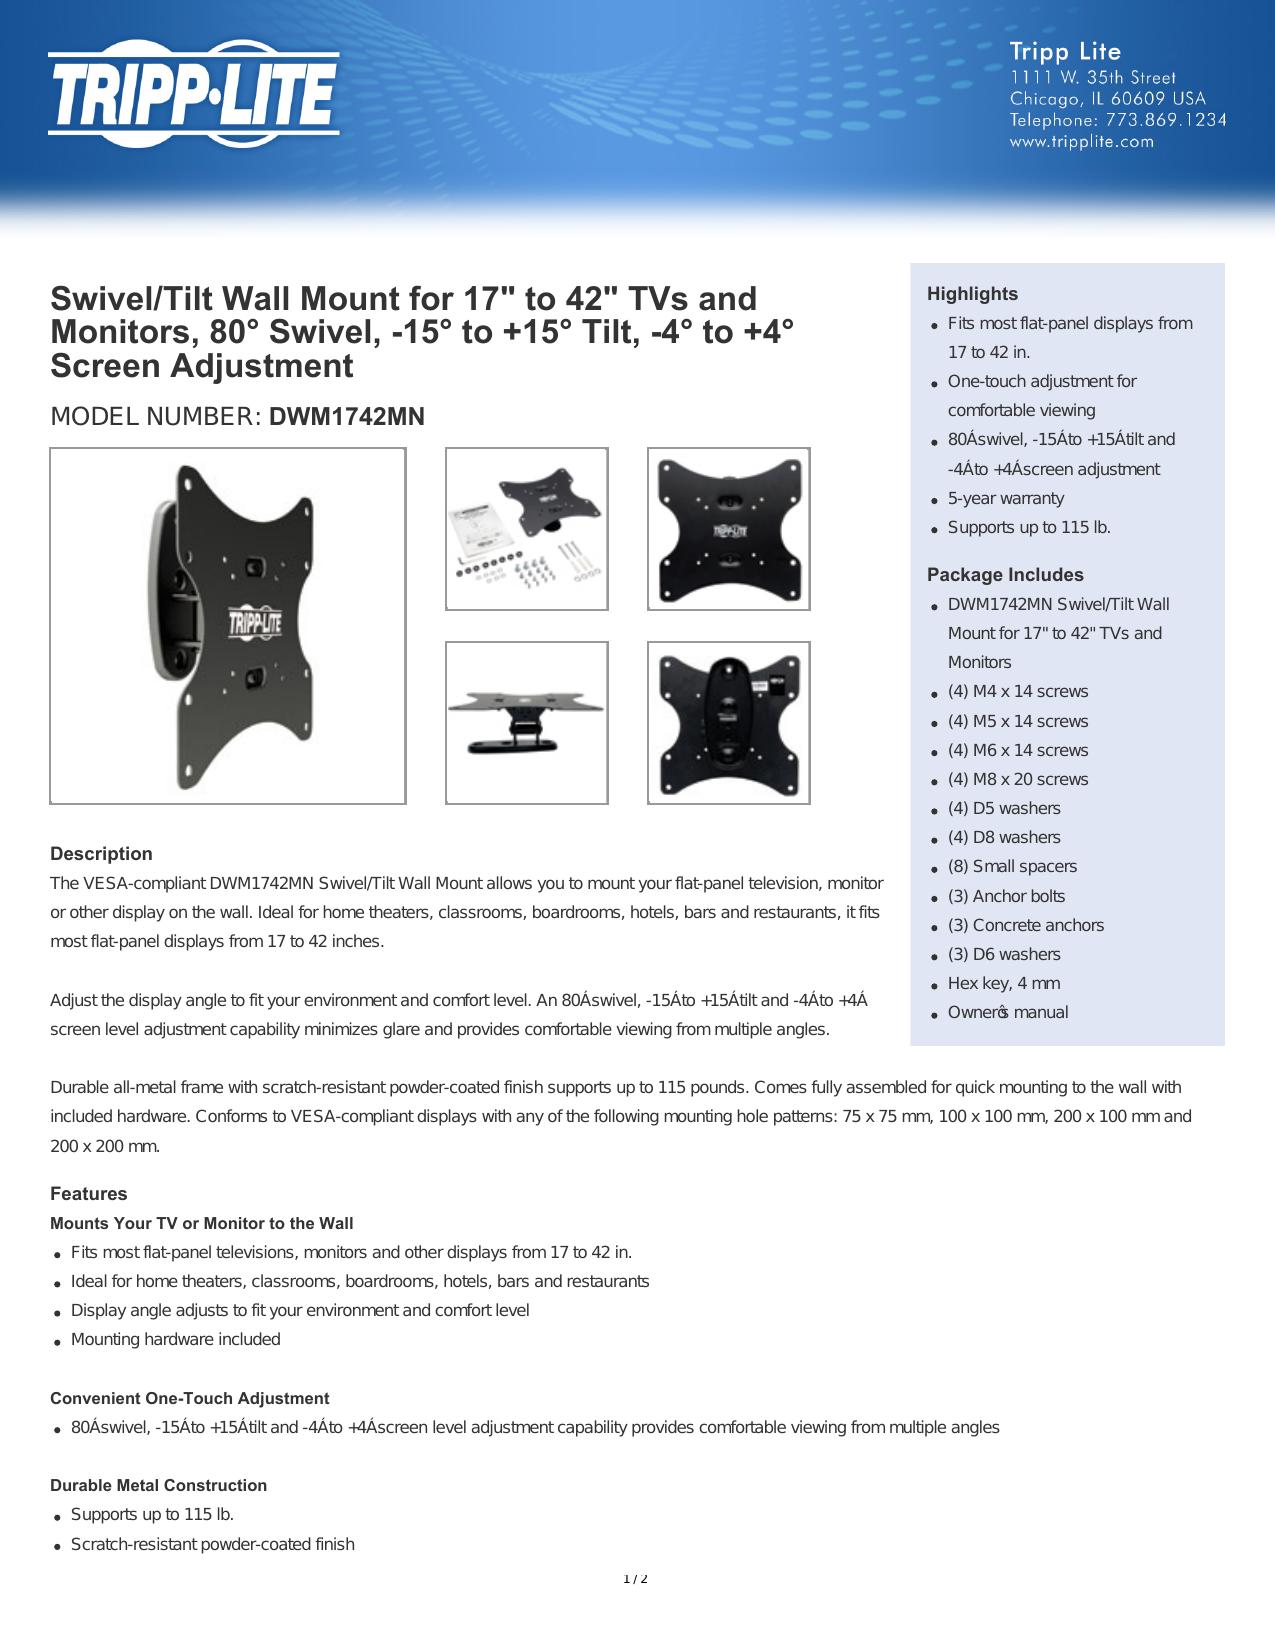 DWM1742MN - Tripp Lite   manualzz com